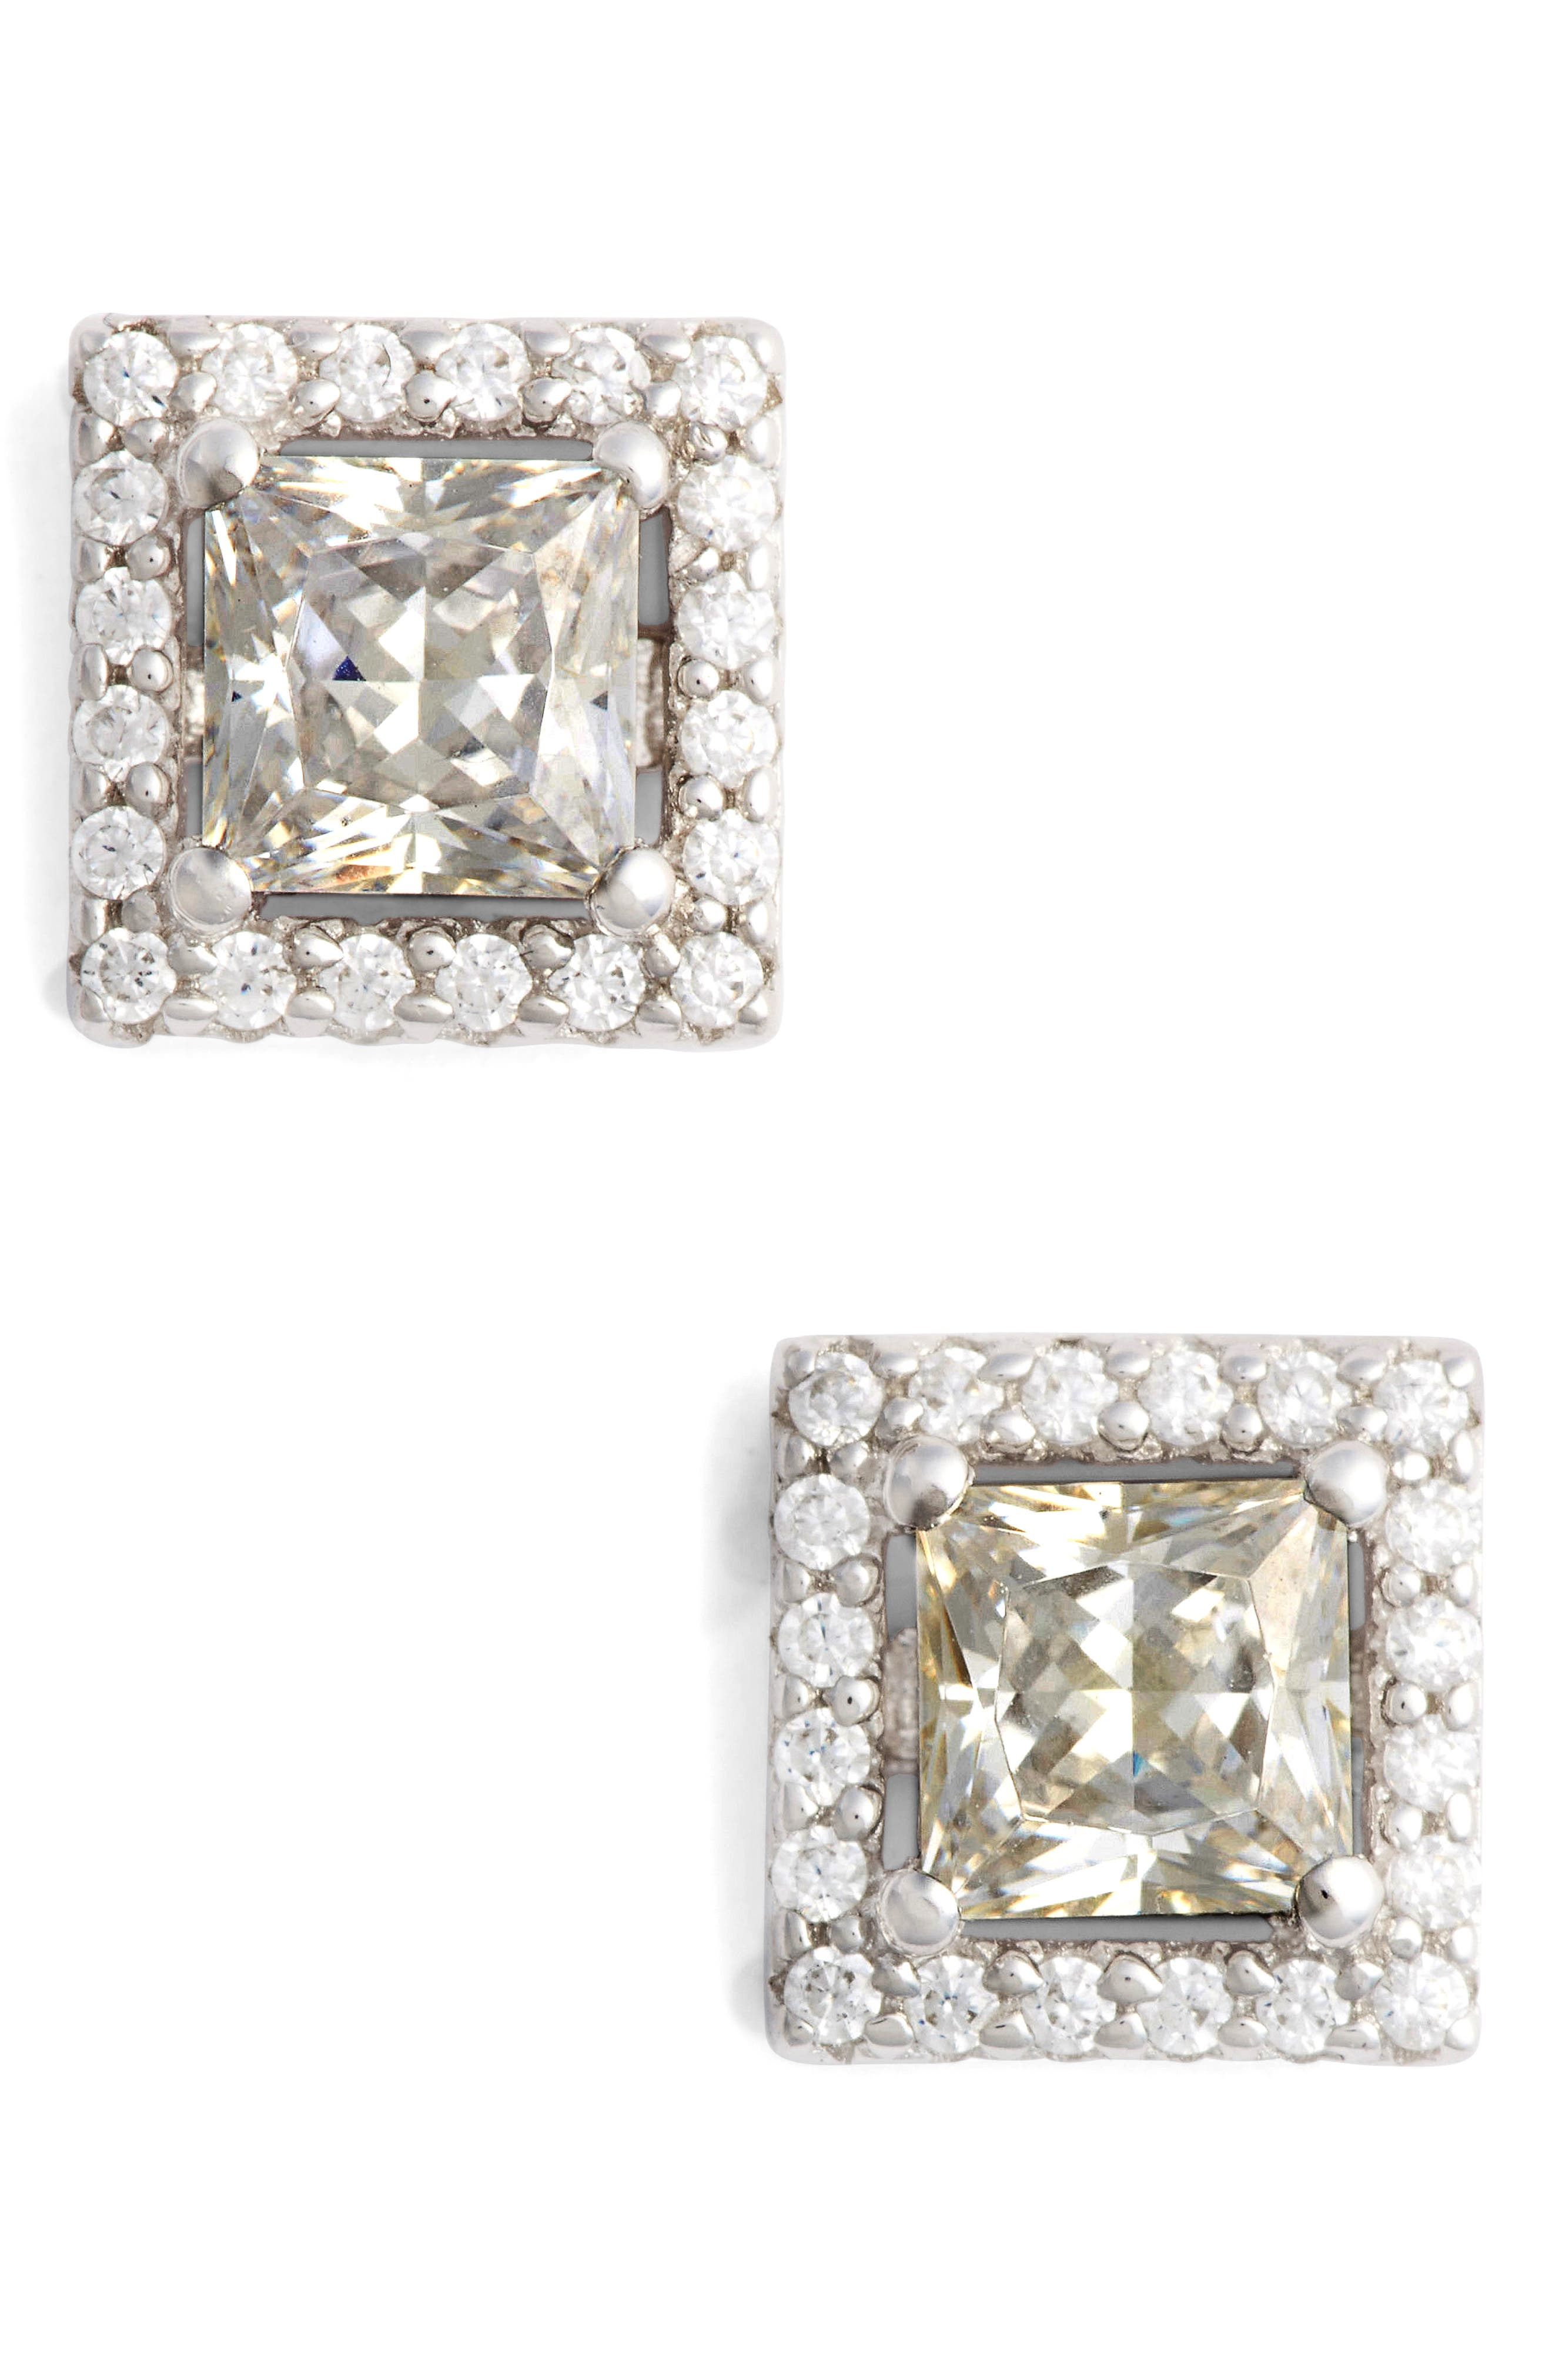 Lafonn Princess Cut Simulated Diamond Stud Earrings